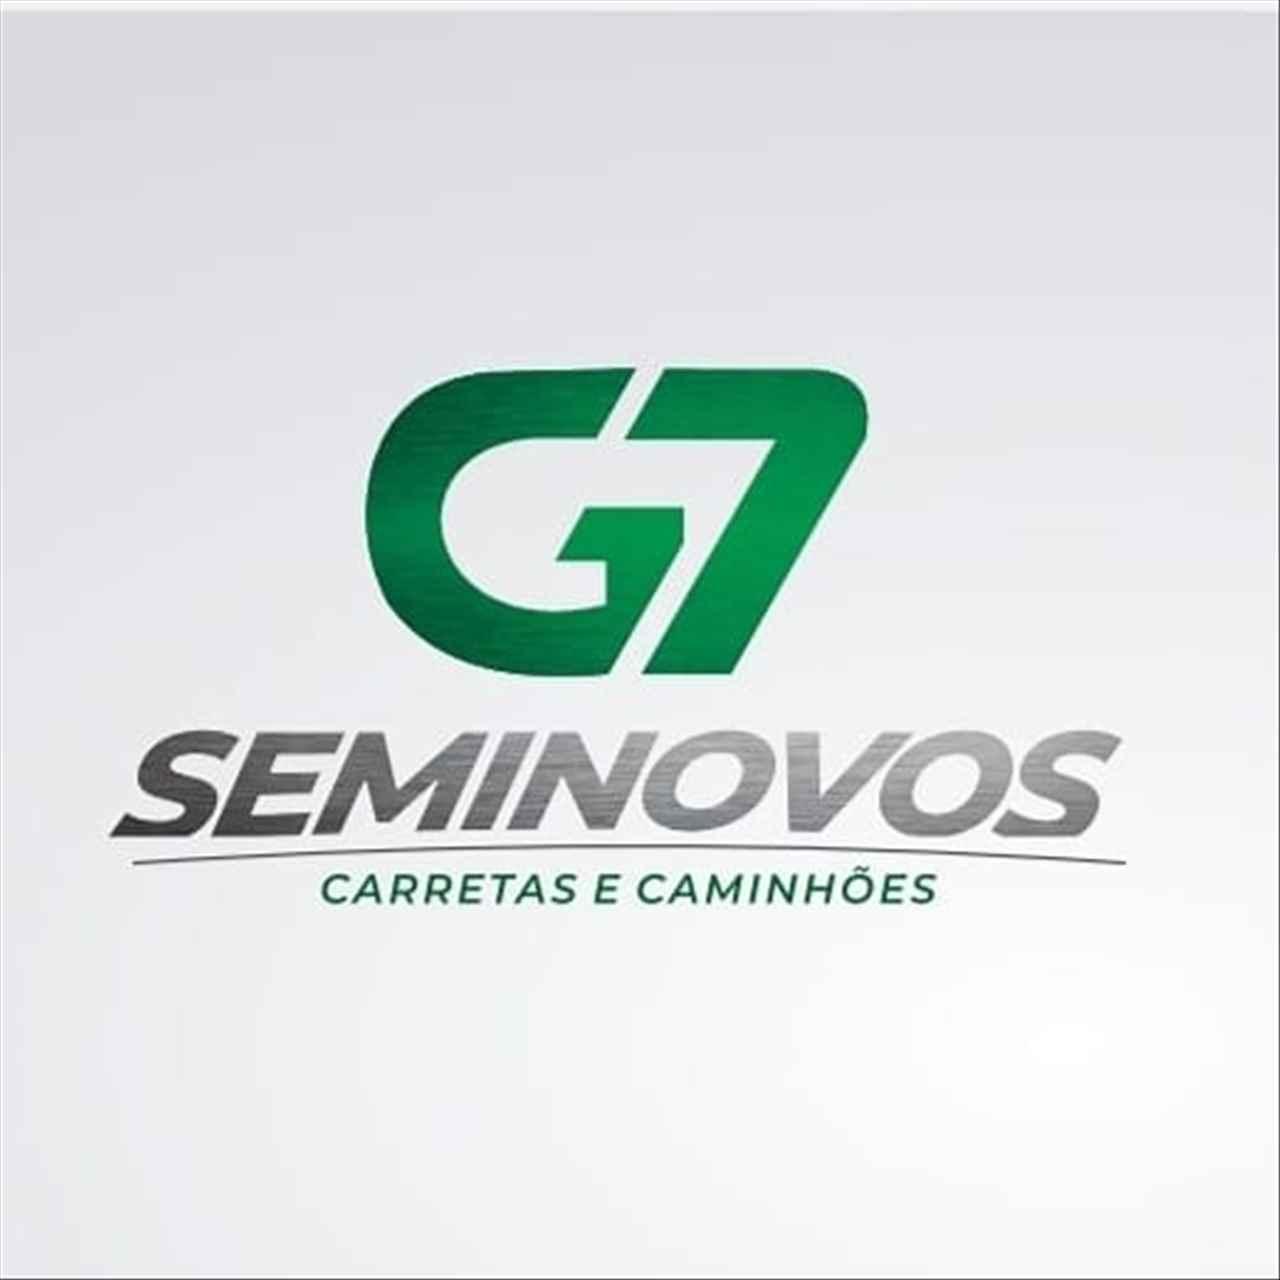 Foto da Loja da G7 Seminovos